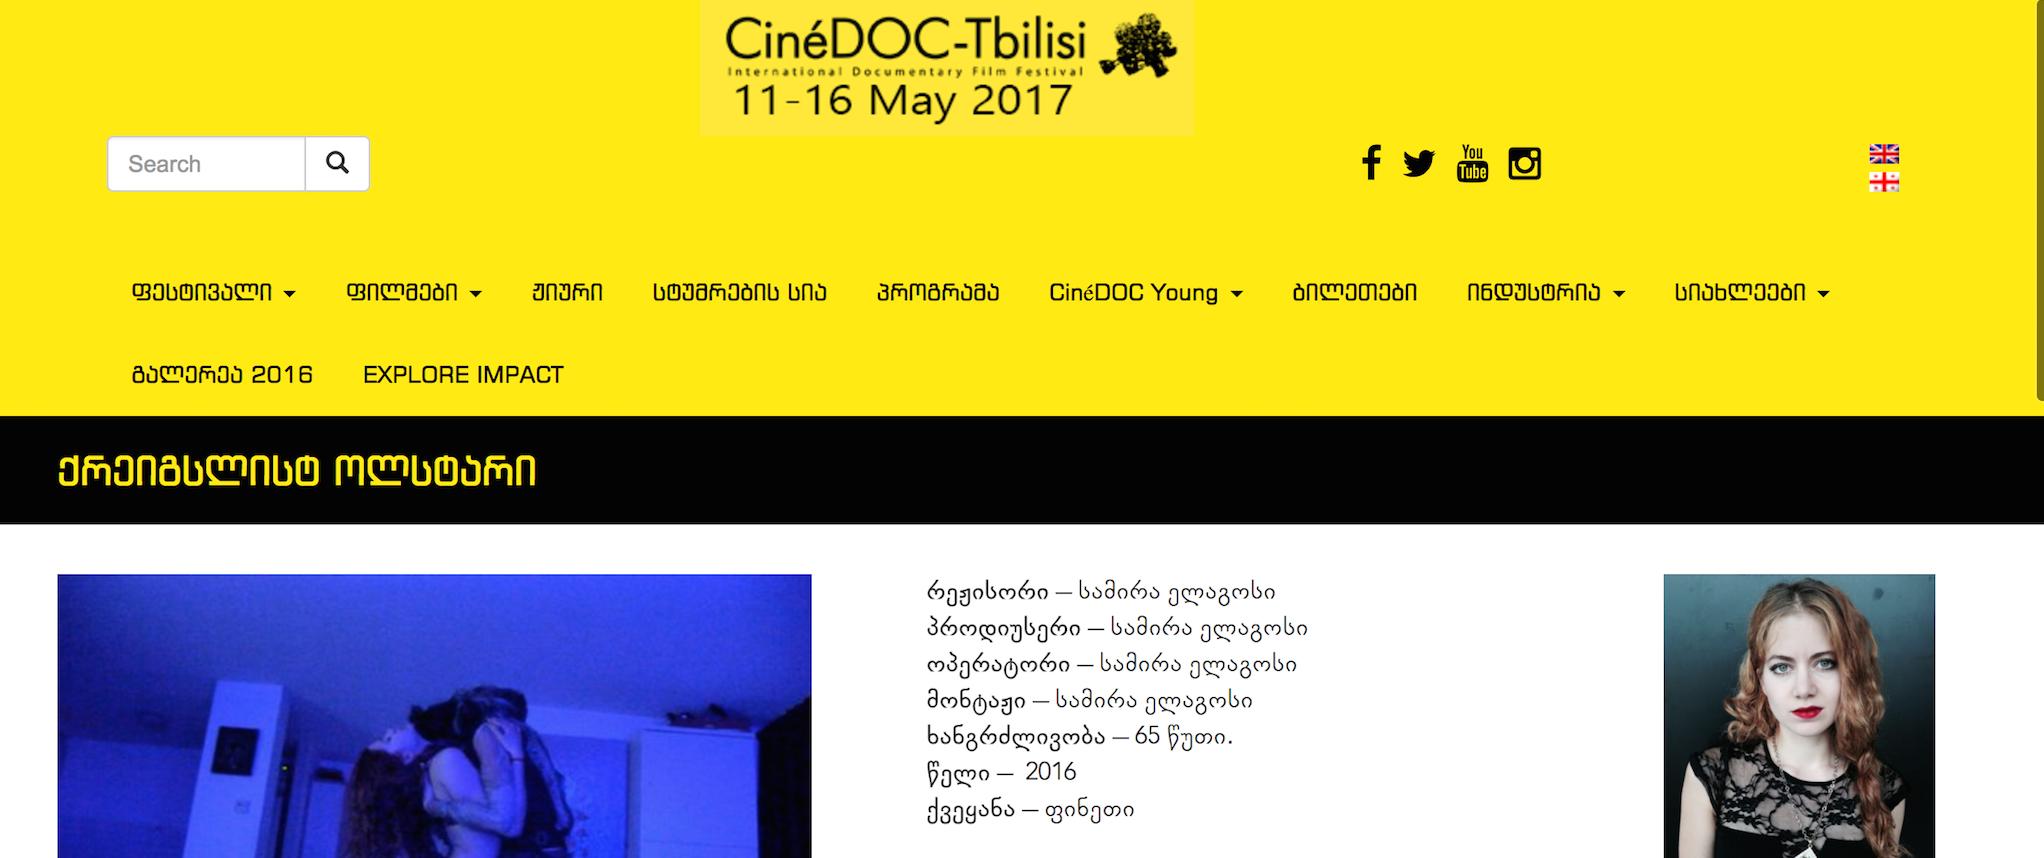 Craigslist Allstars at CinéDOC-Tbilisi, 12 & 15.5